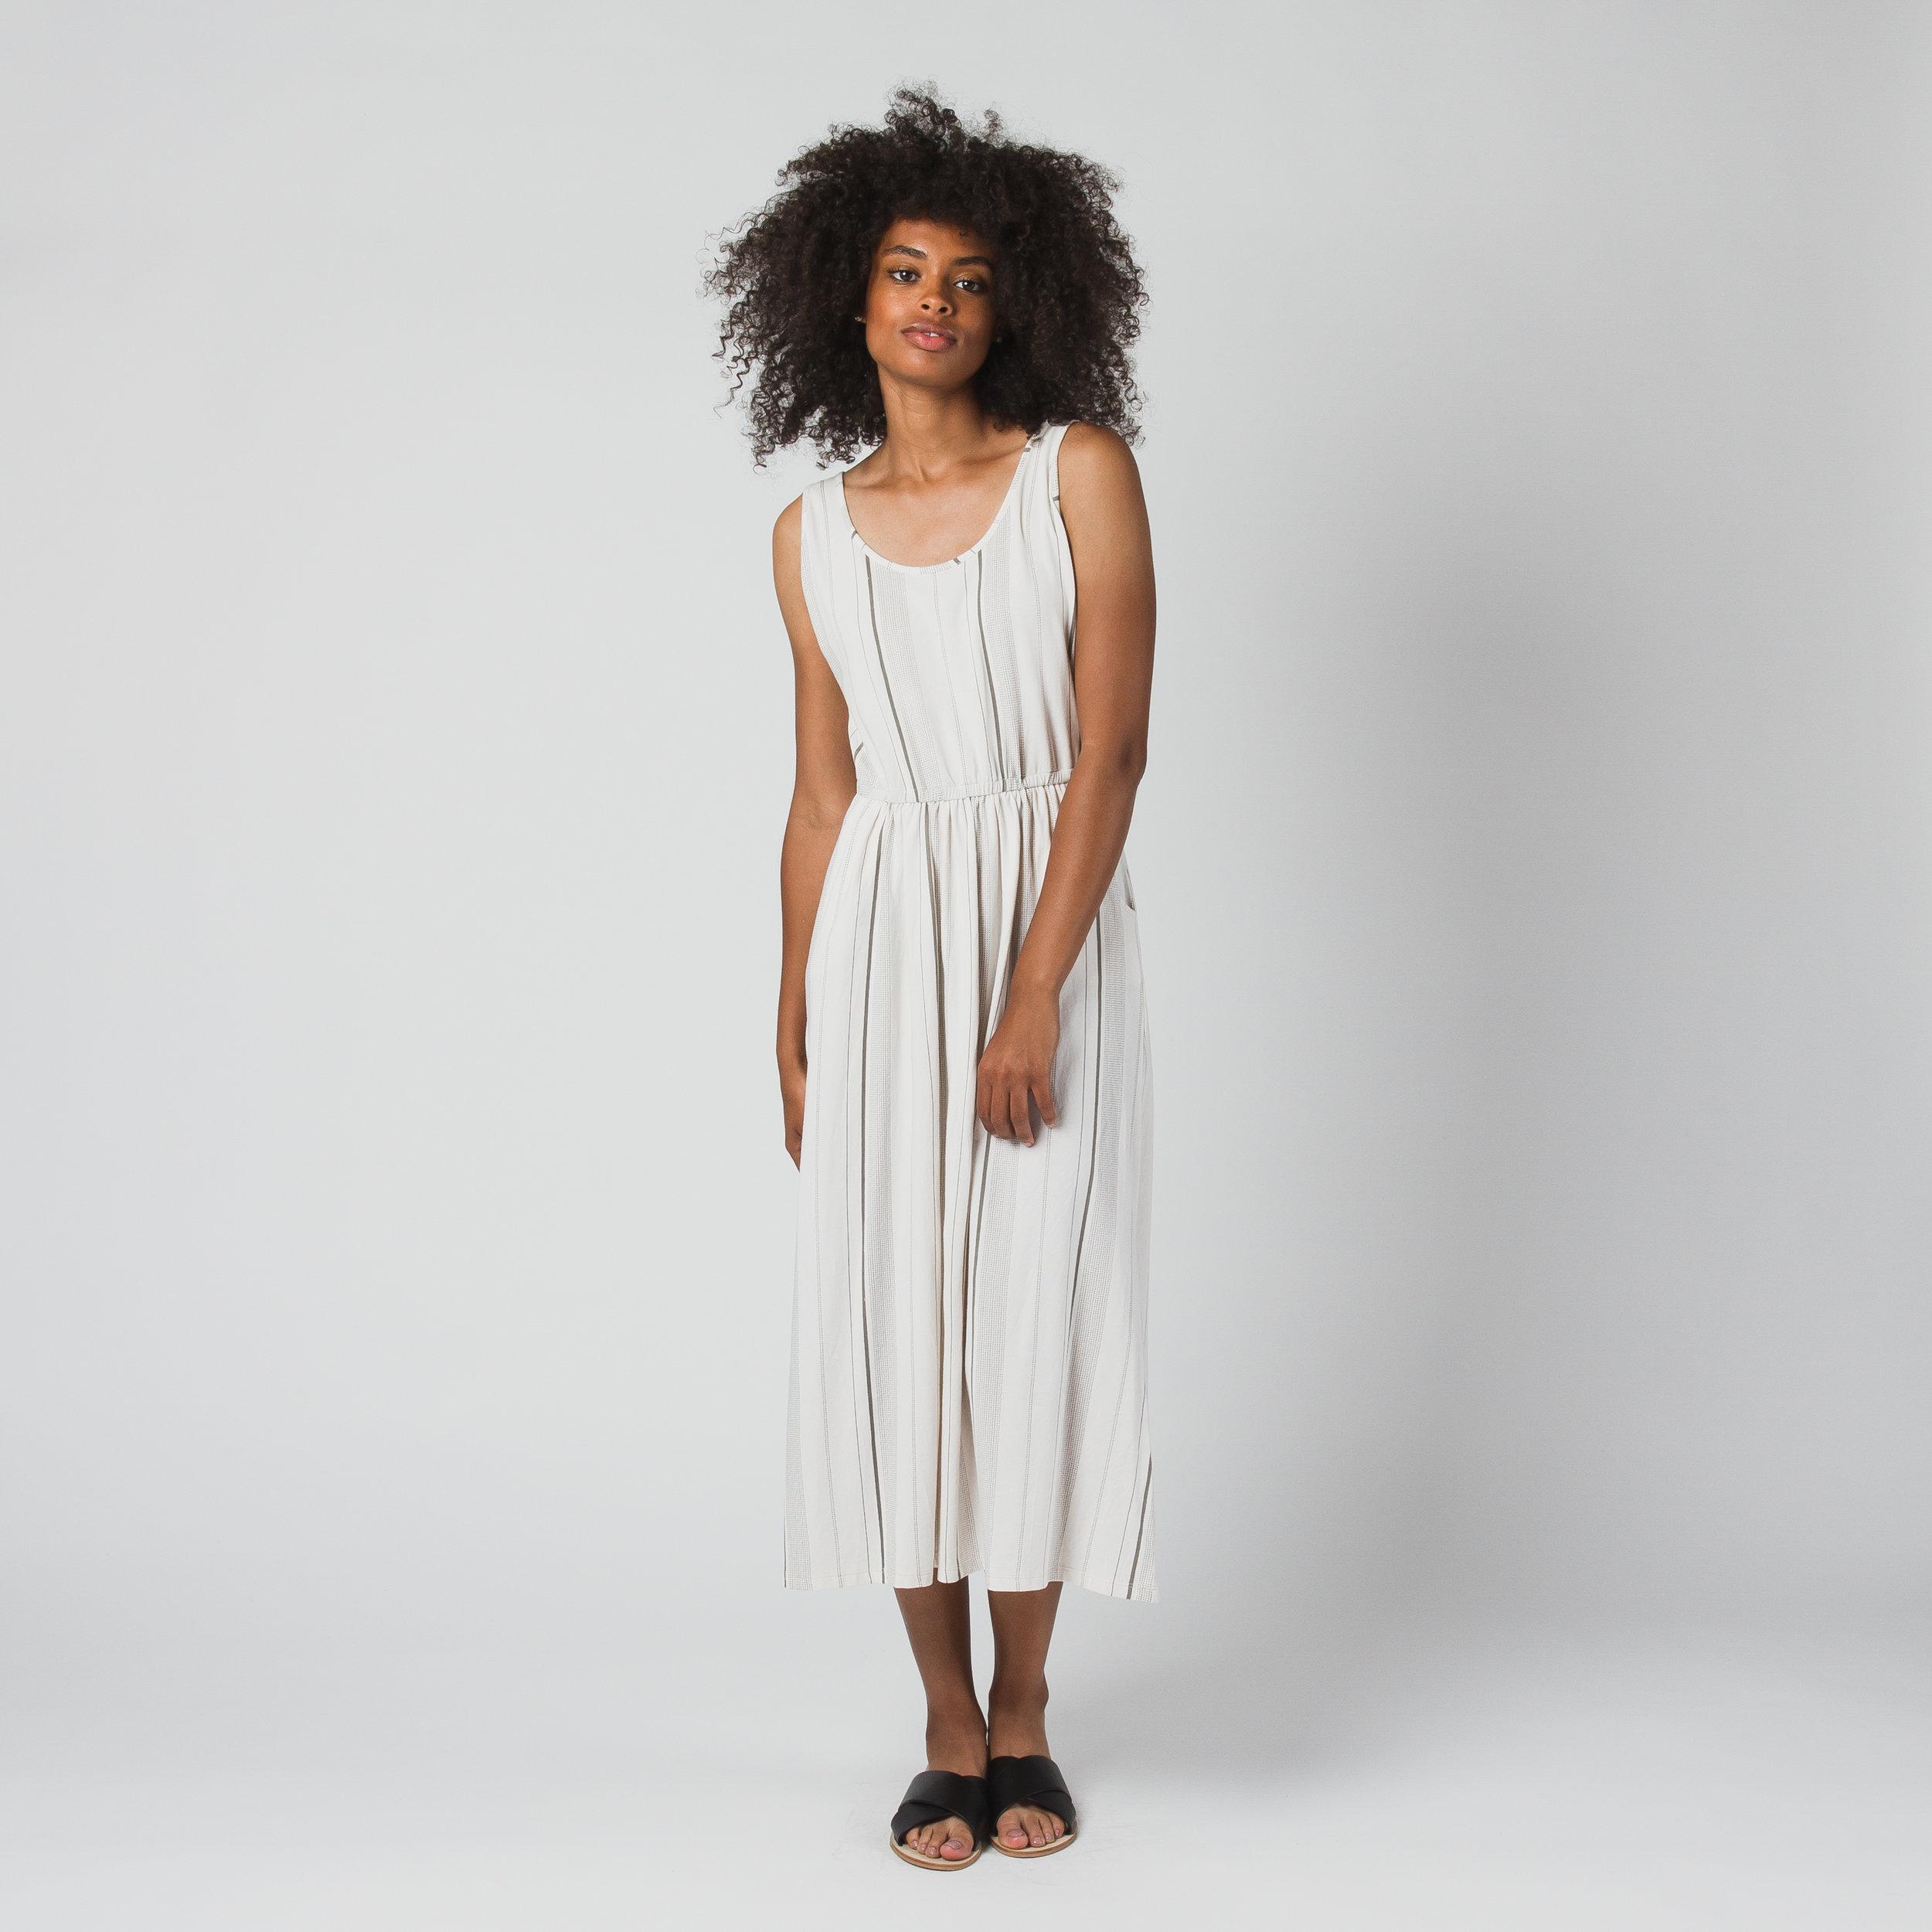 KNOWN SUPPLY MARINA DRESS